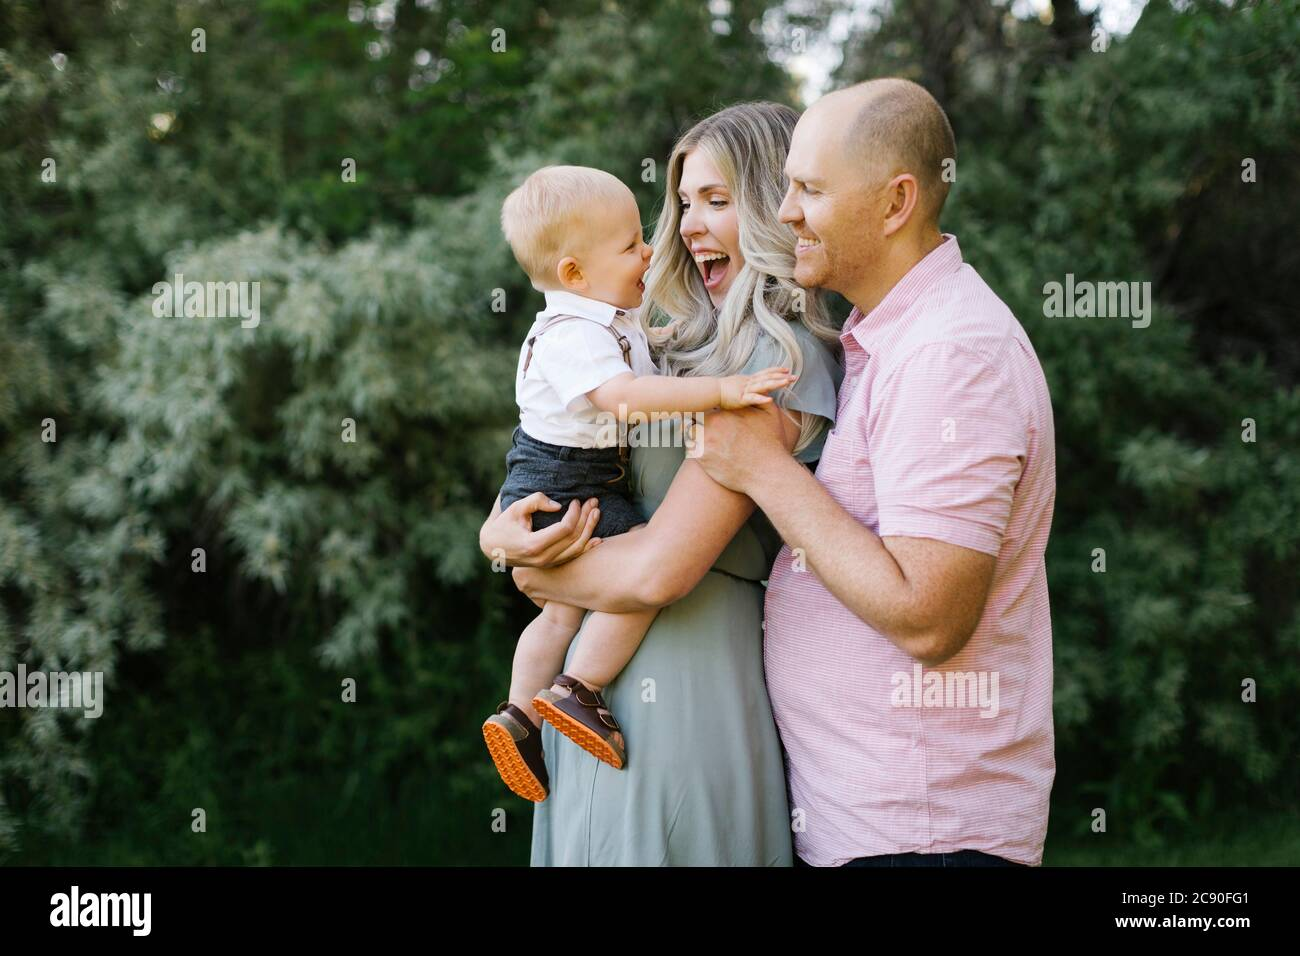 Eltern umarmen mit Baby Sohn im Freien Stockfoto